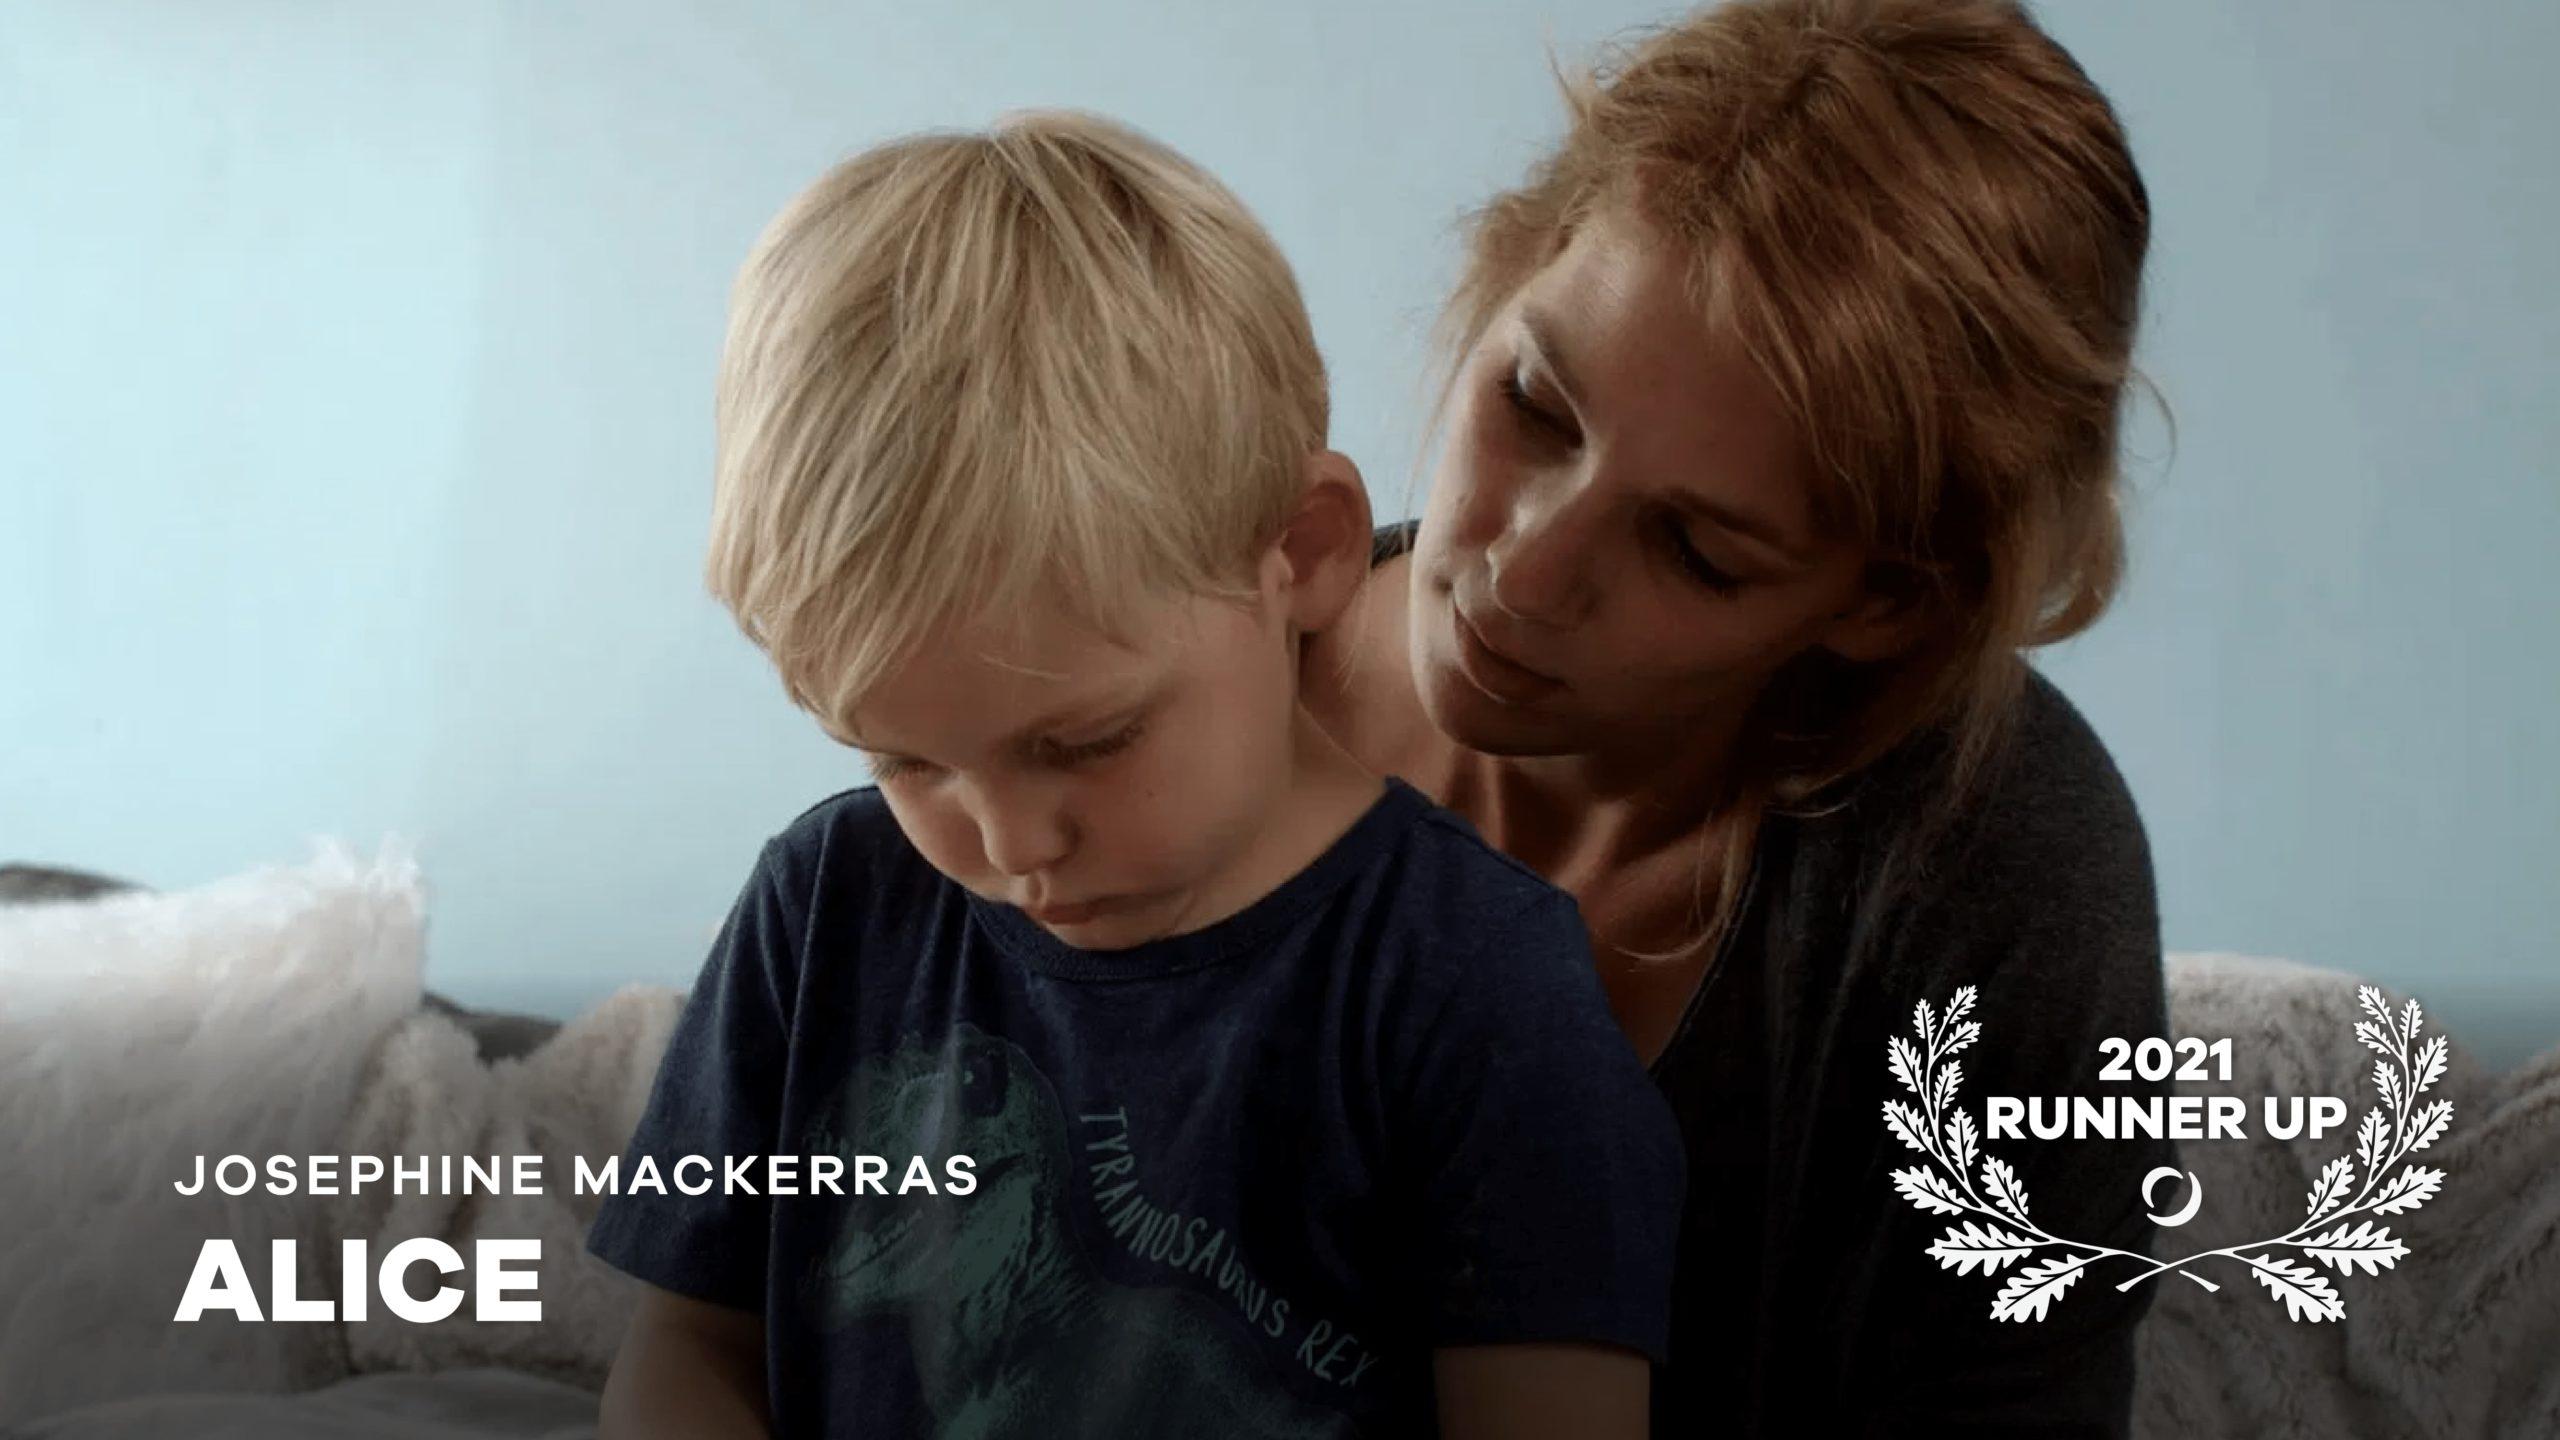 OFFA 2021 Best International Feature Film or Documentary Runner Up